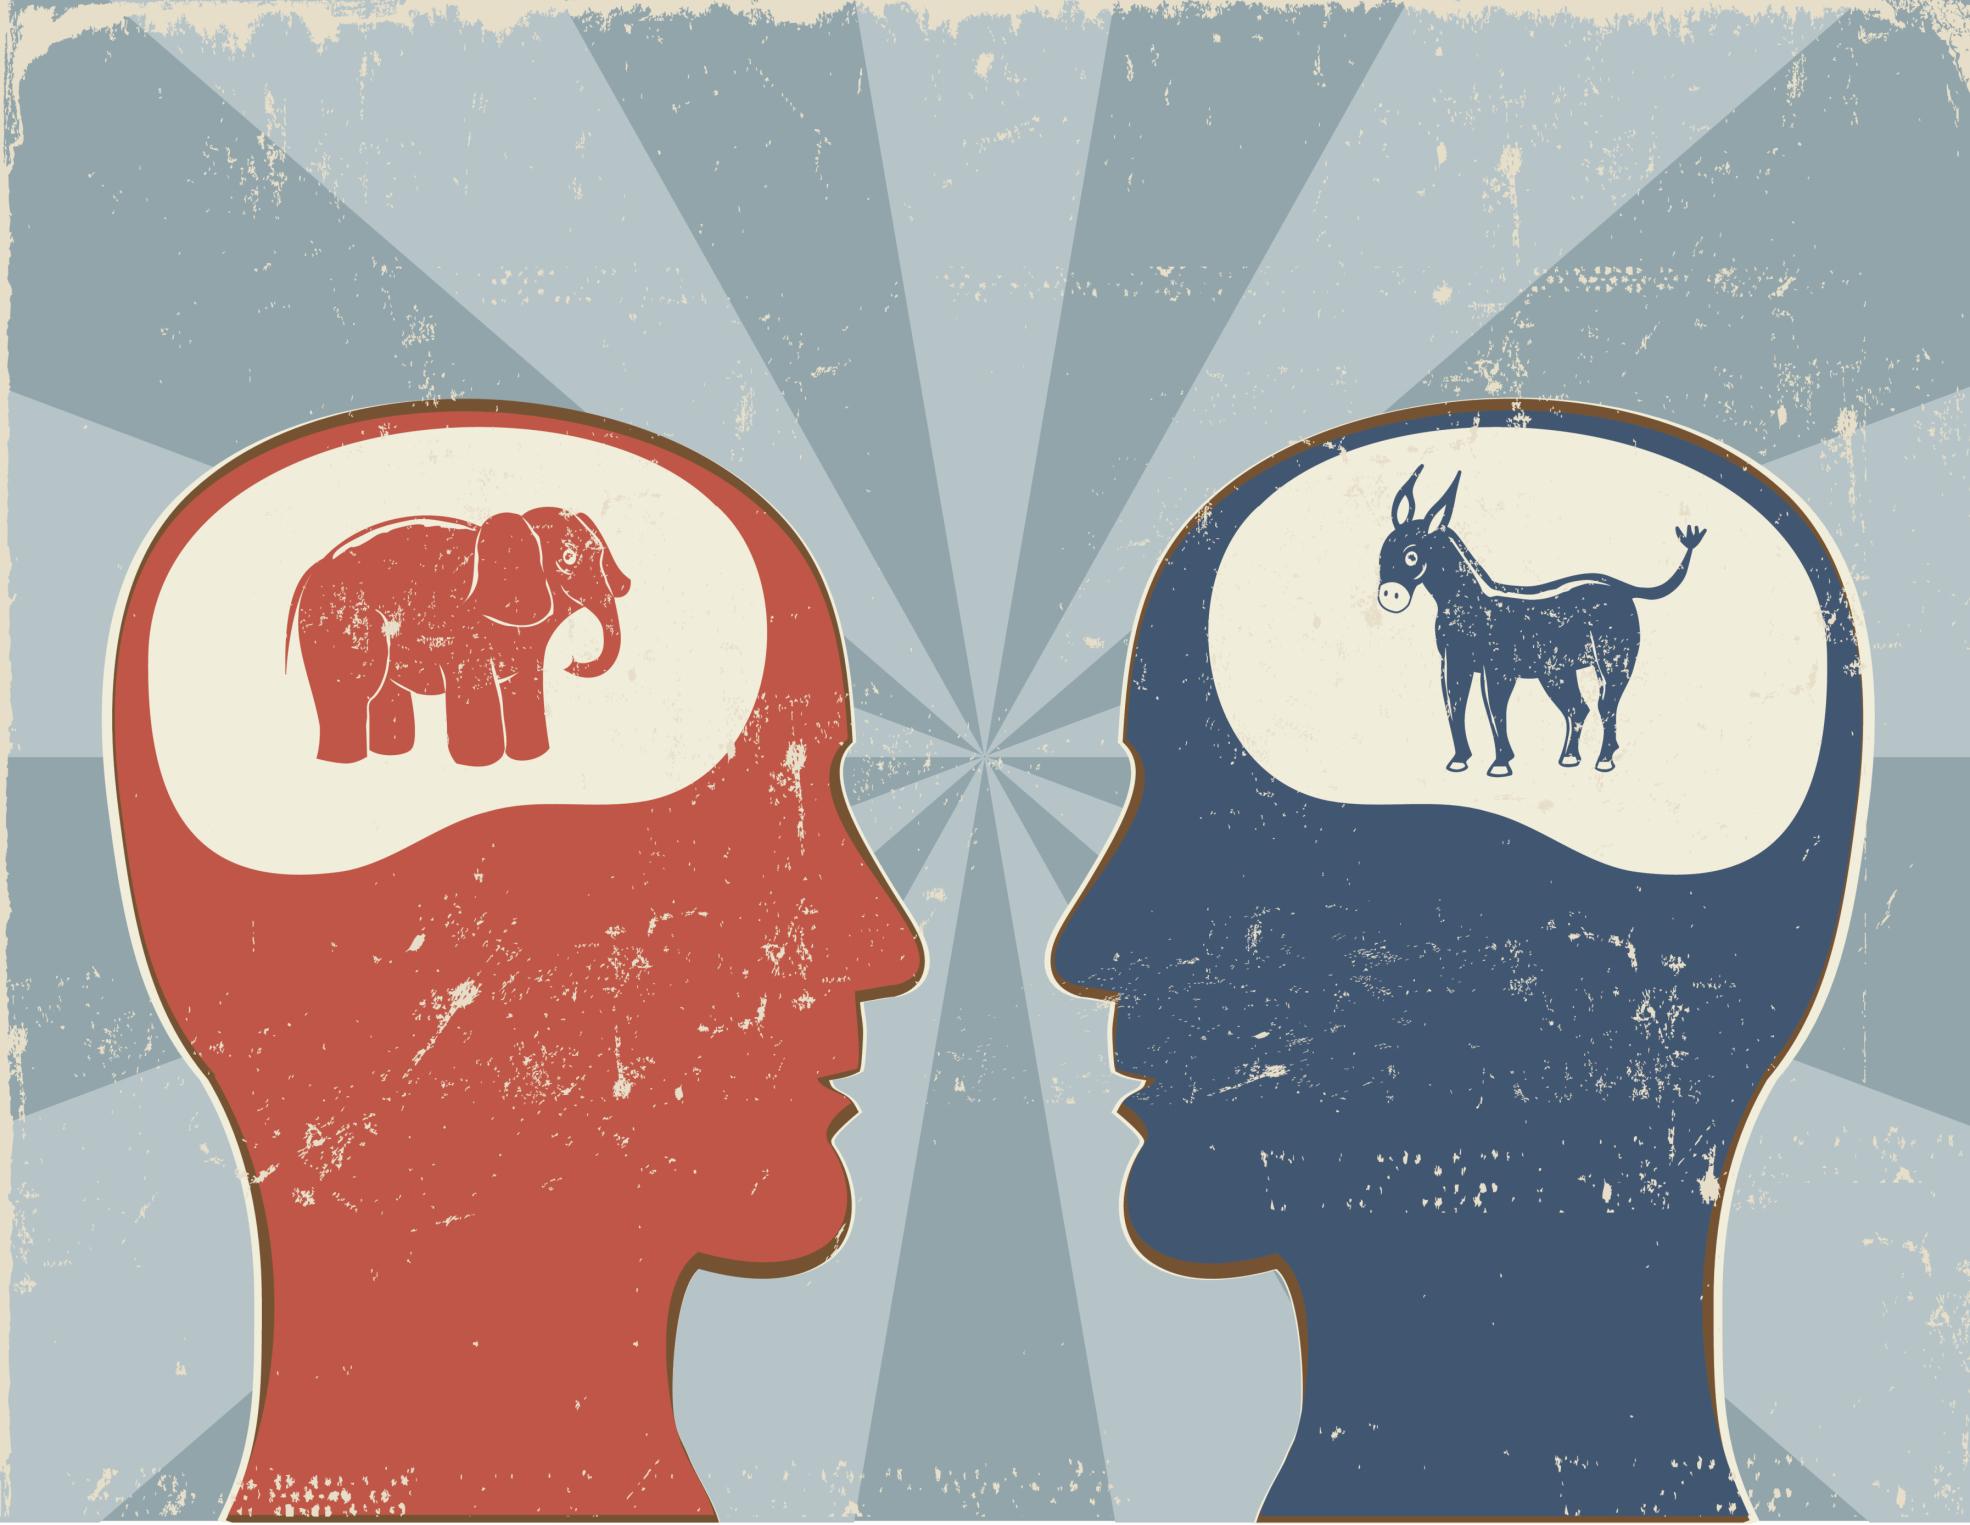 Democrat vs. Republican Profiles Radiating Background